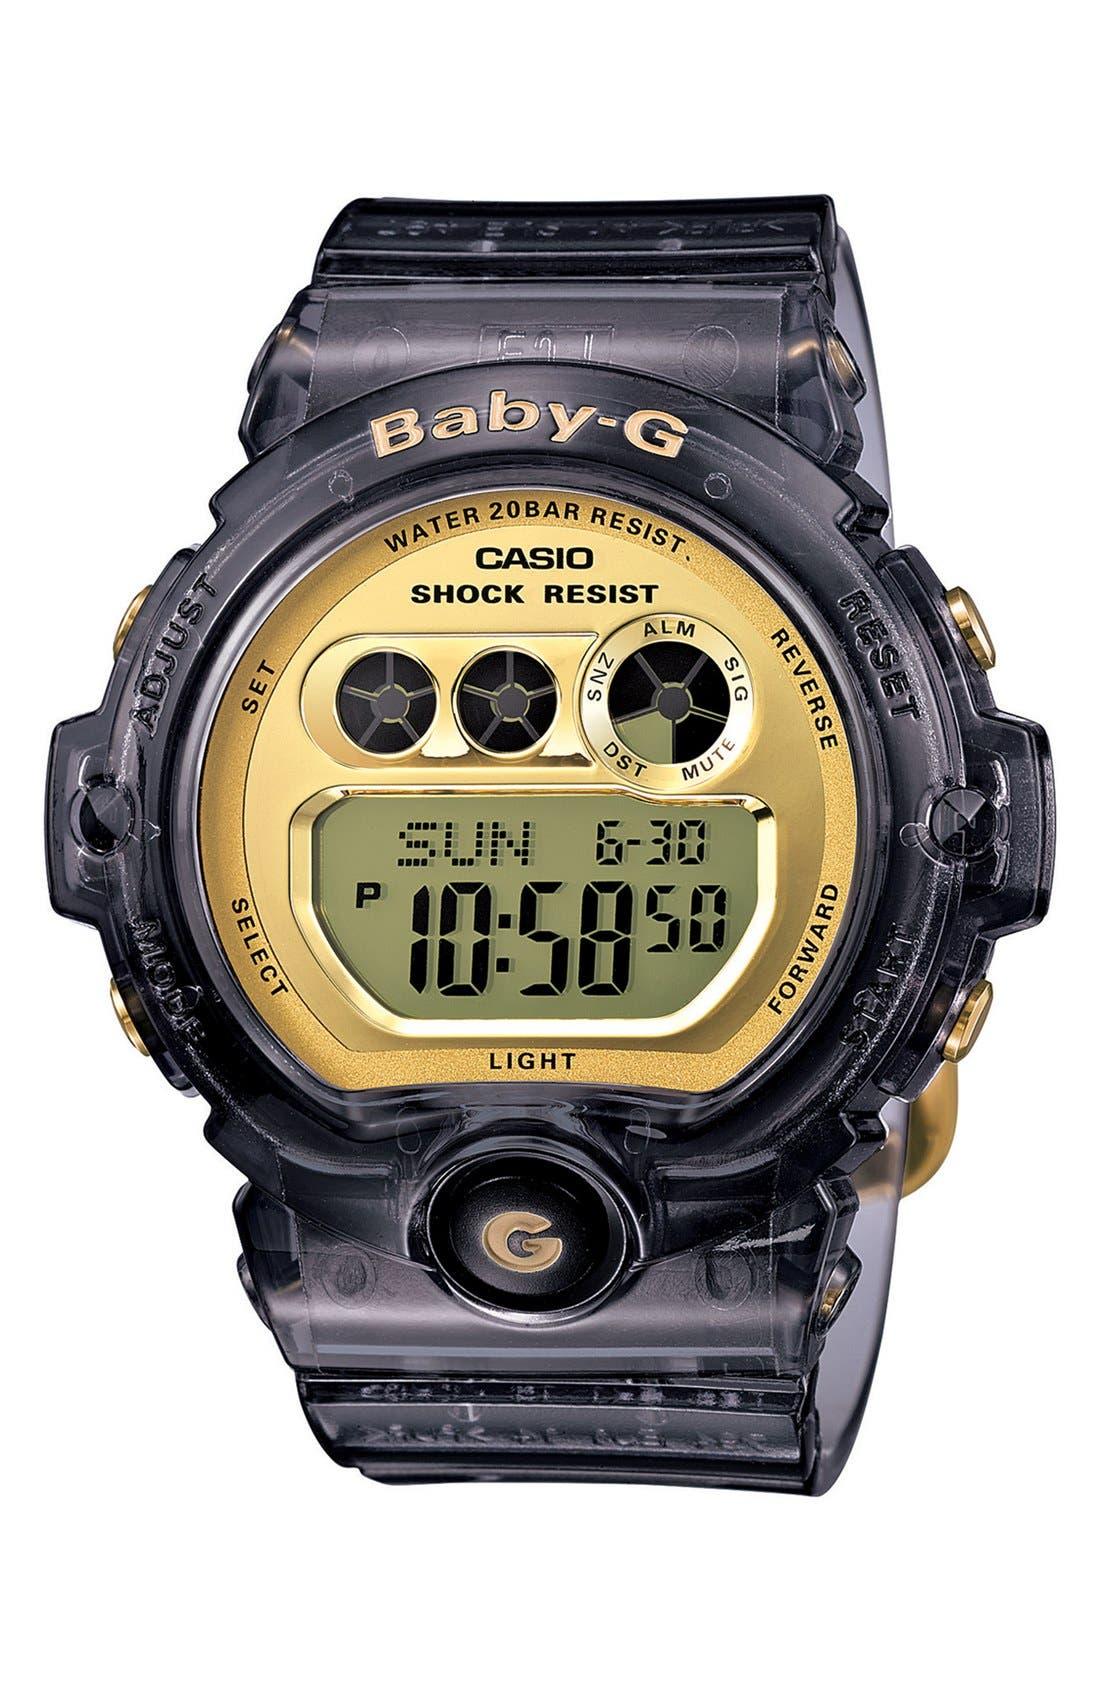 Main Image - Baby-G 'Transparent Marine' Digital Watch, 45mm x 39mm